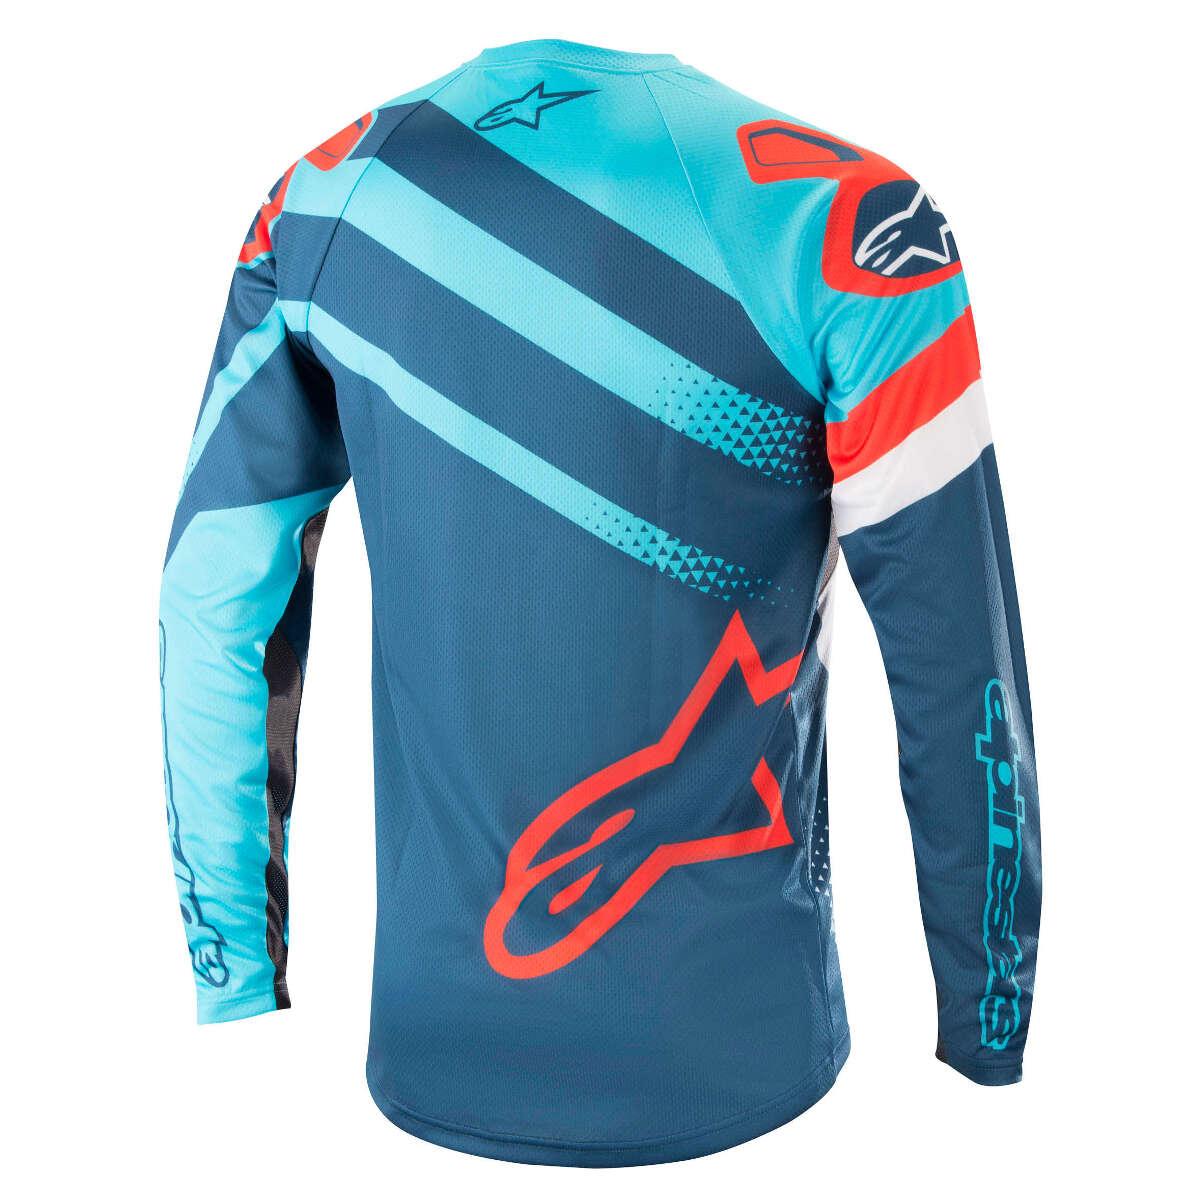 Alpinestars Downhill-Jersey Downhill-Jersey Downhill-Jersey Langarm Racer Atoll Blau Poseidon Blau 8d6477